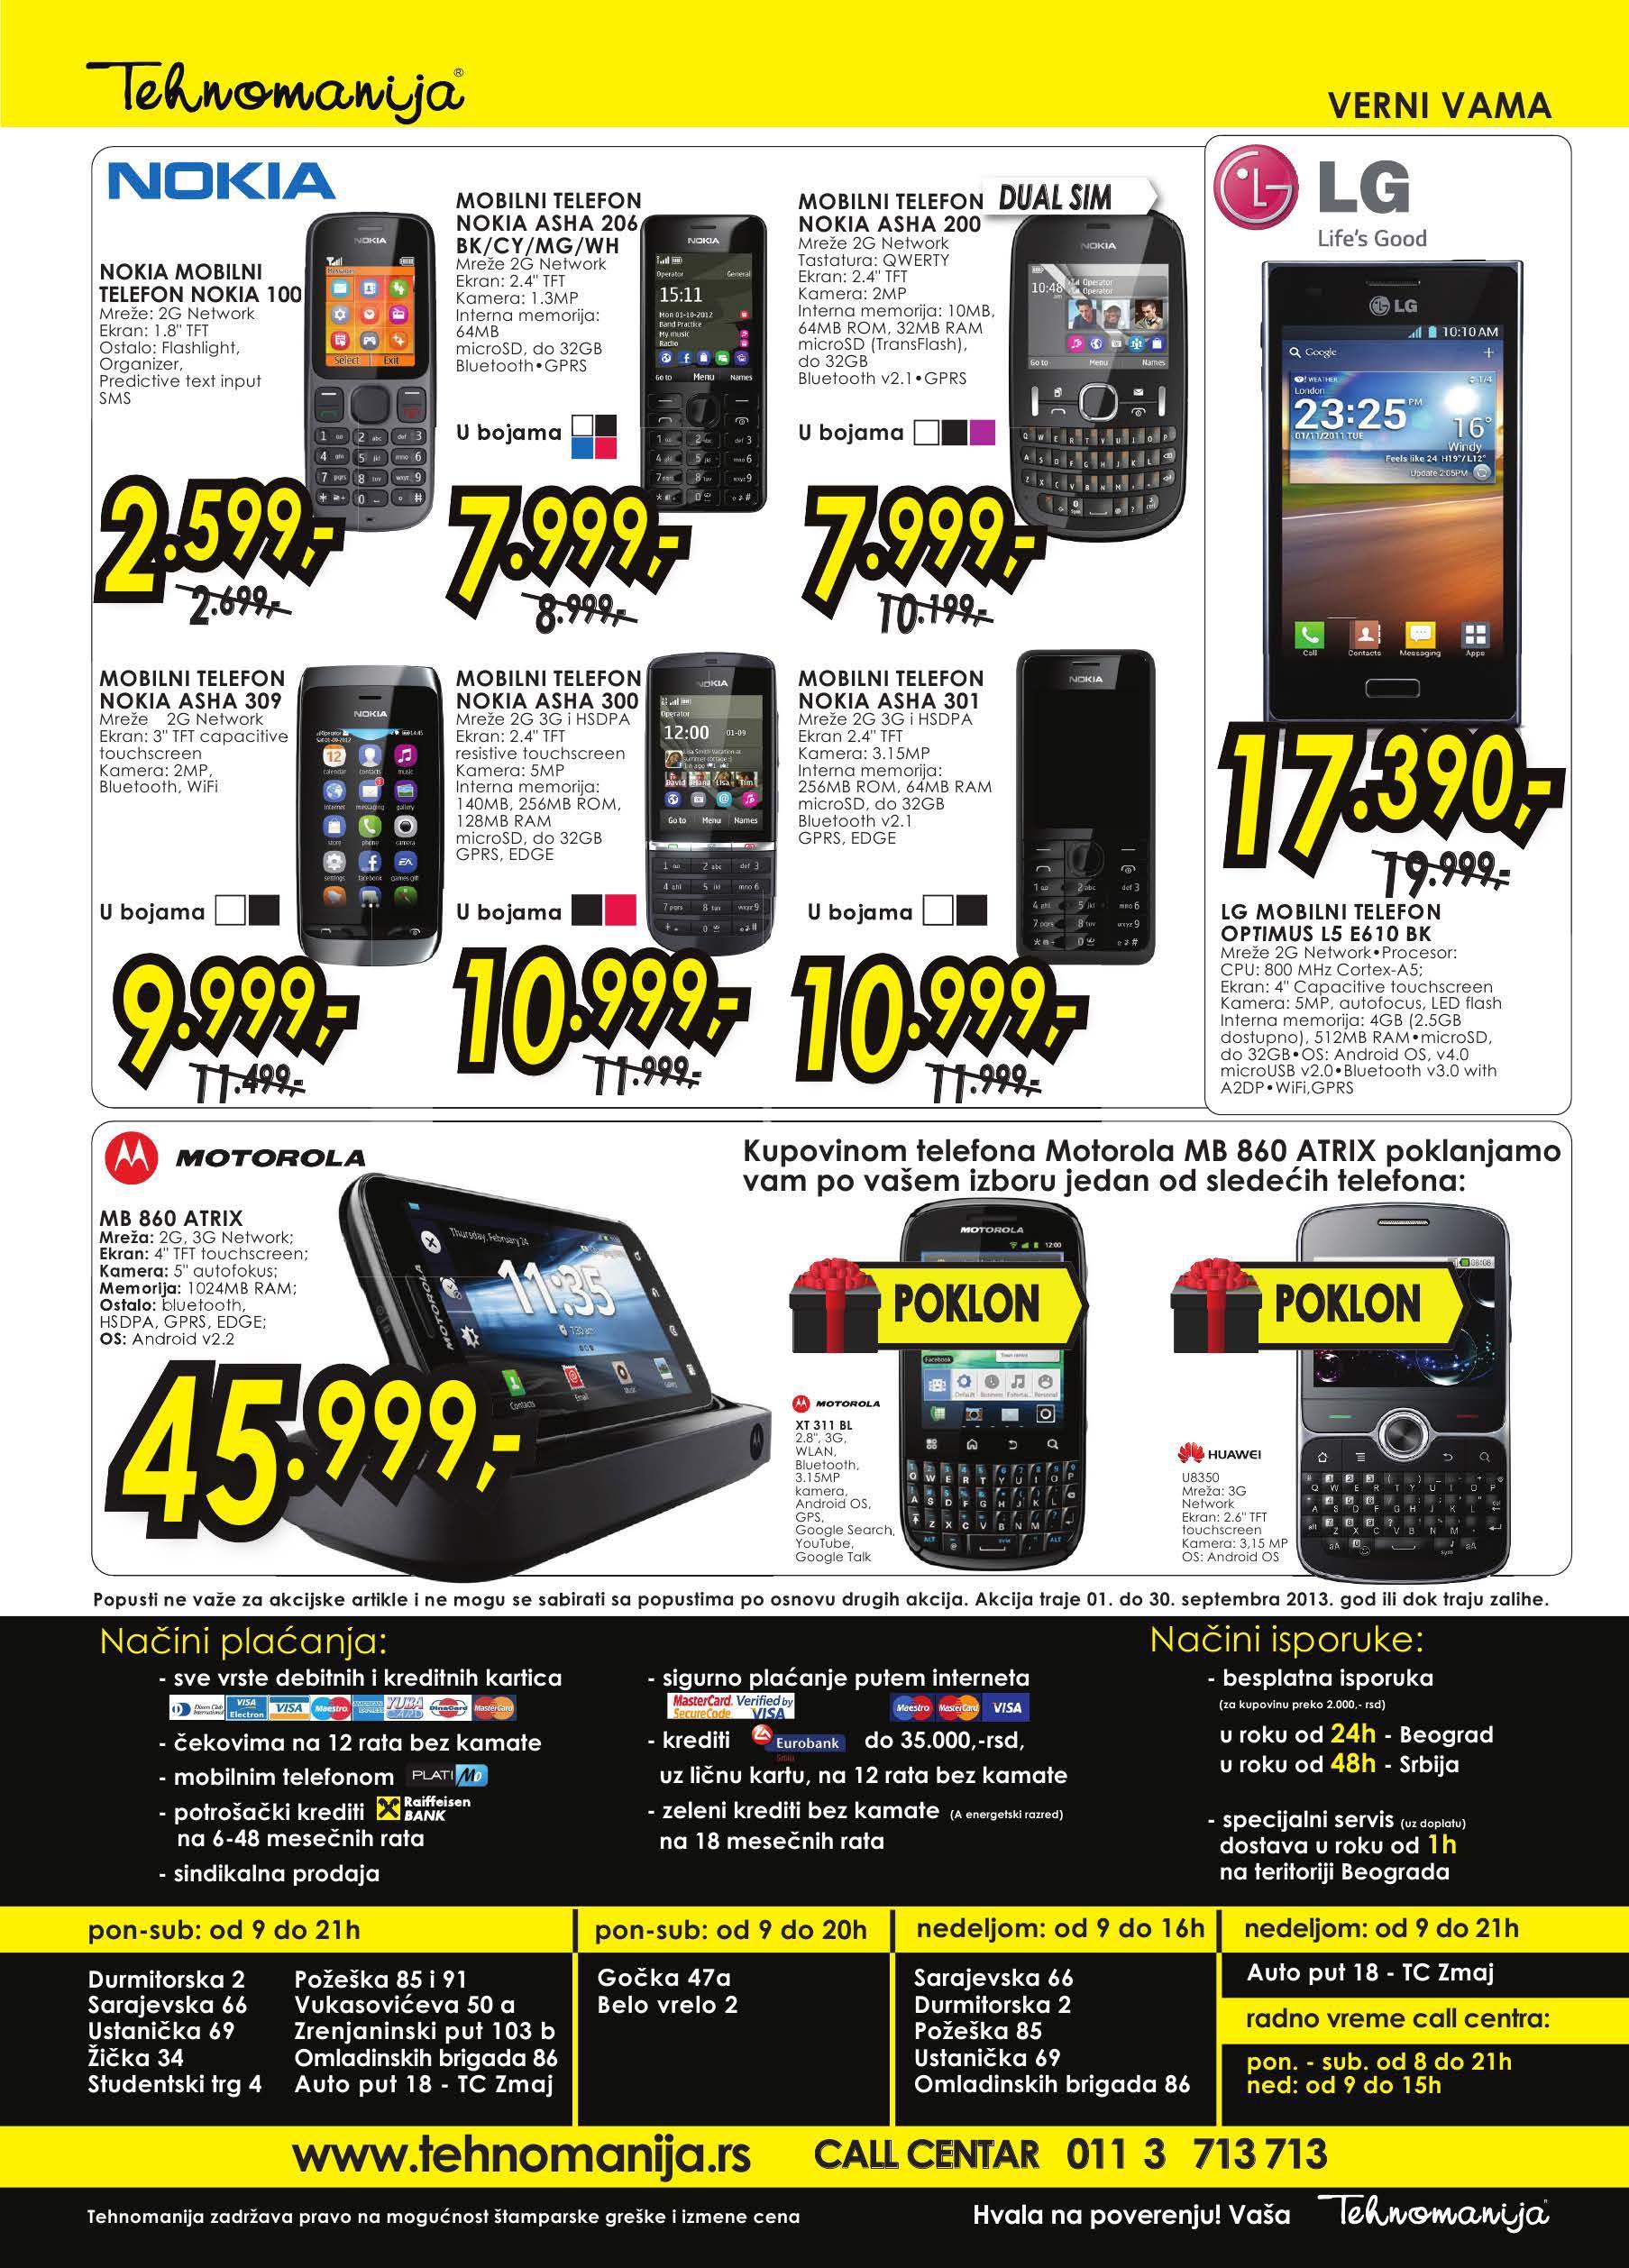 Tehnomanija katalog IT Shop po super ceni